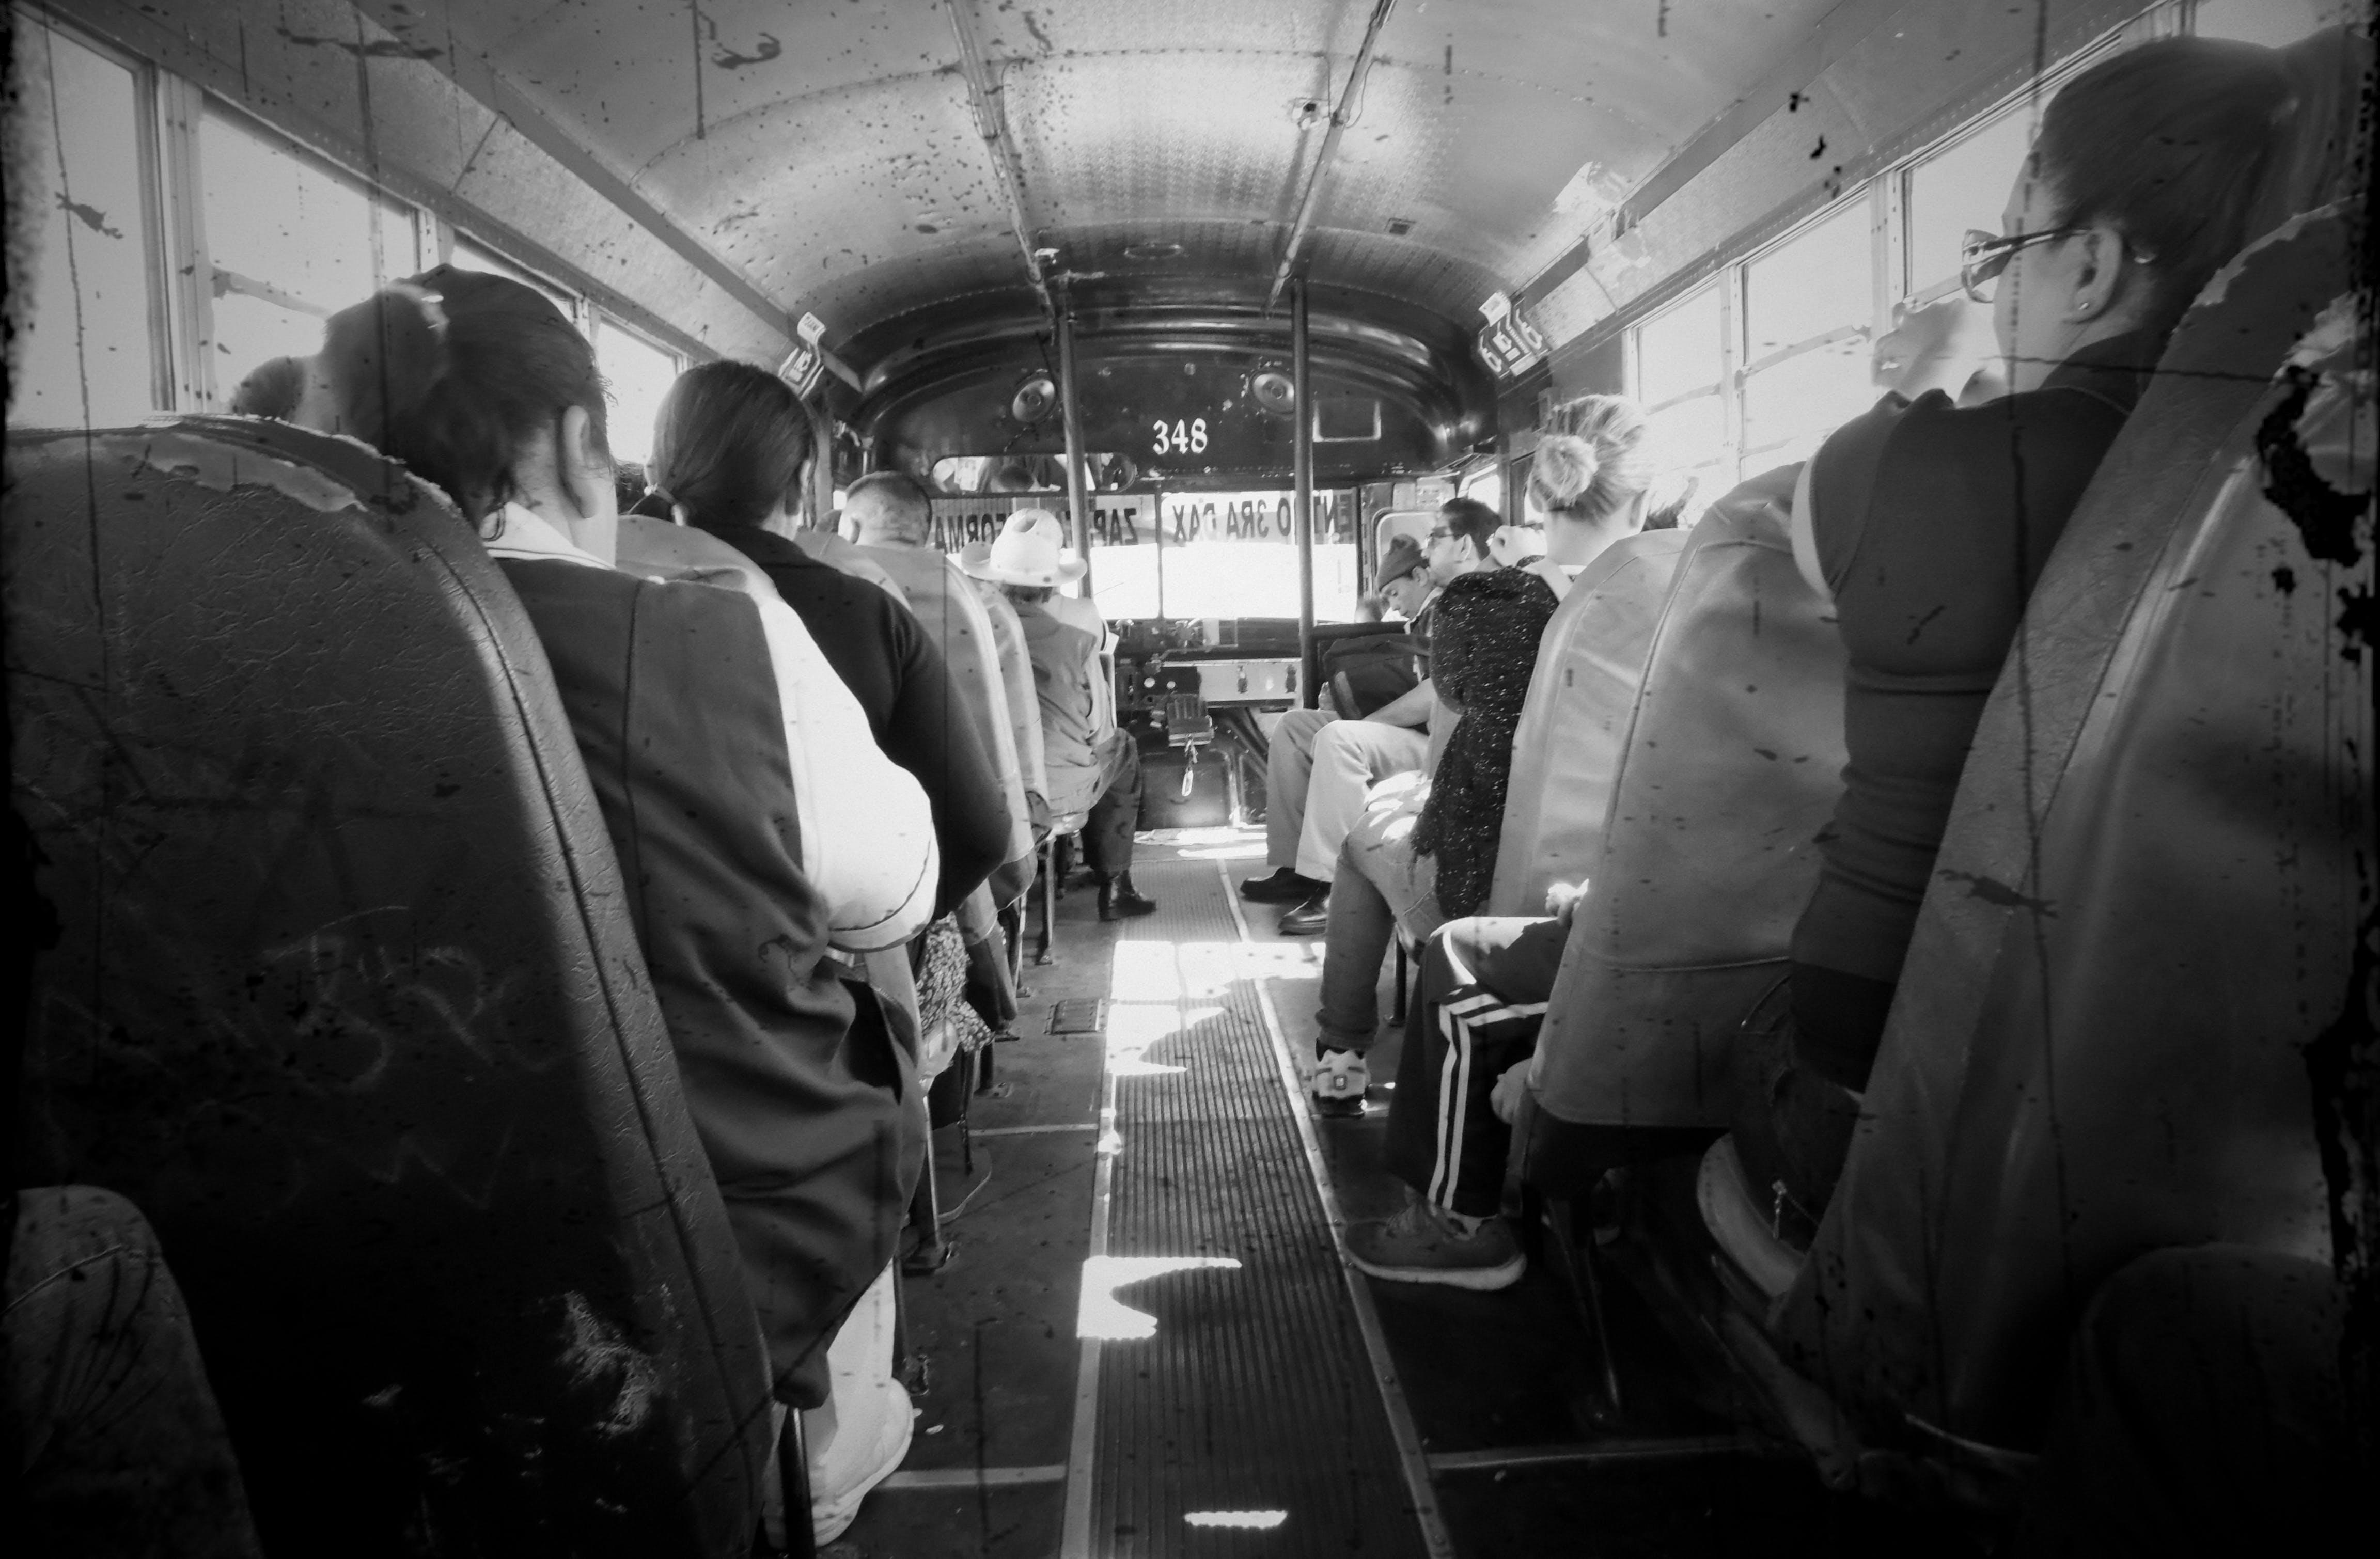 Free stock photo of Autobus, fotografia, Personas, urbano